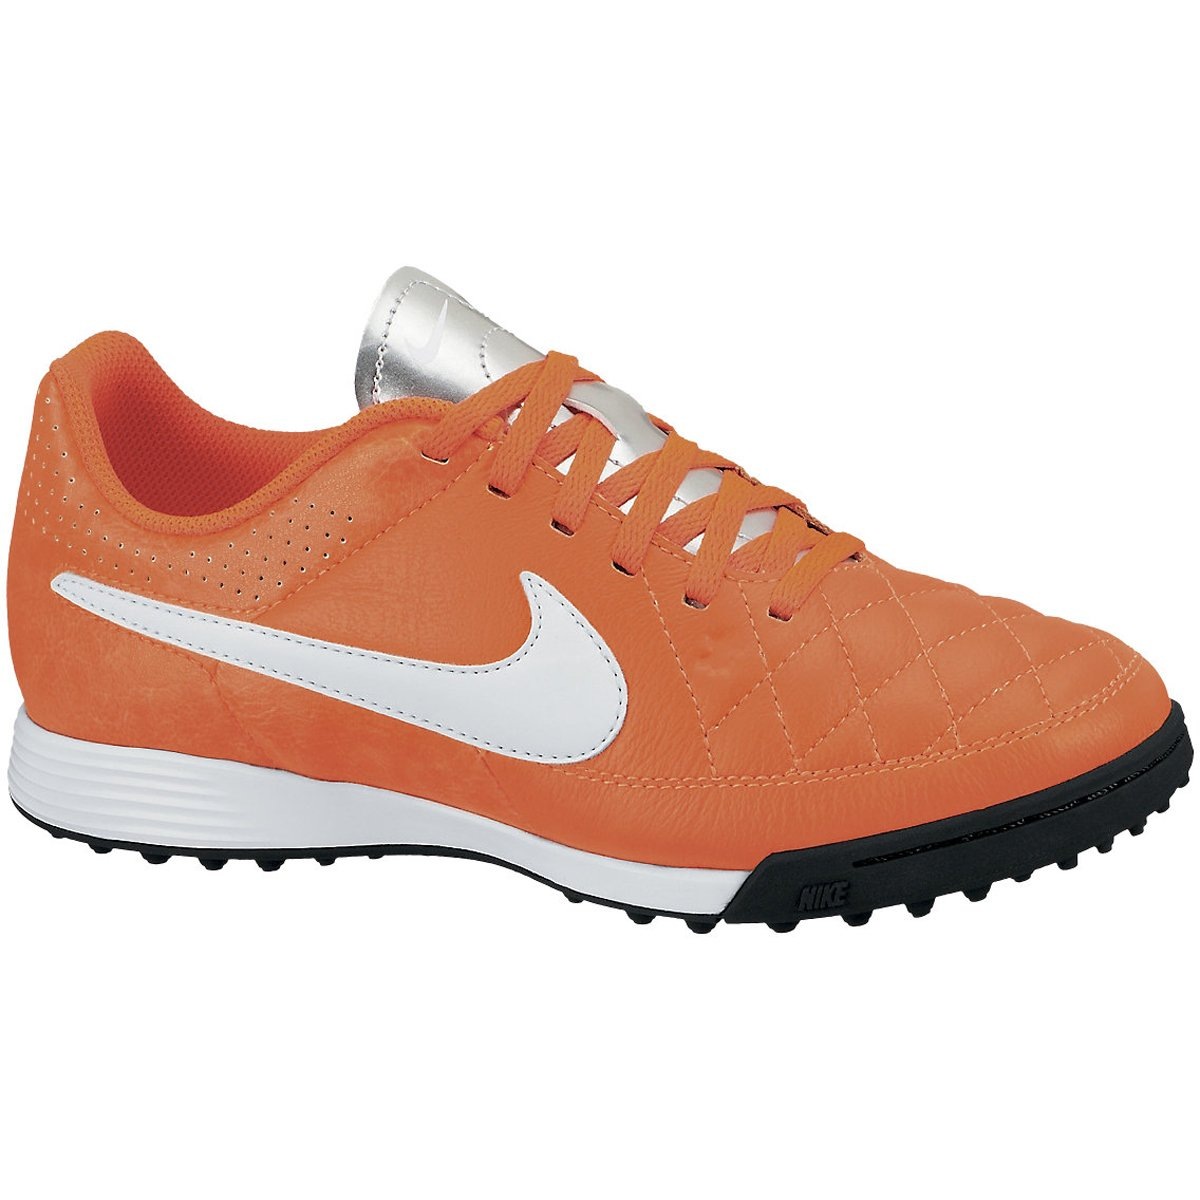 Chuteira Nike Tiempo Gênio Leather TF Society Infantil - Compre Agora  21991ebfa768f